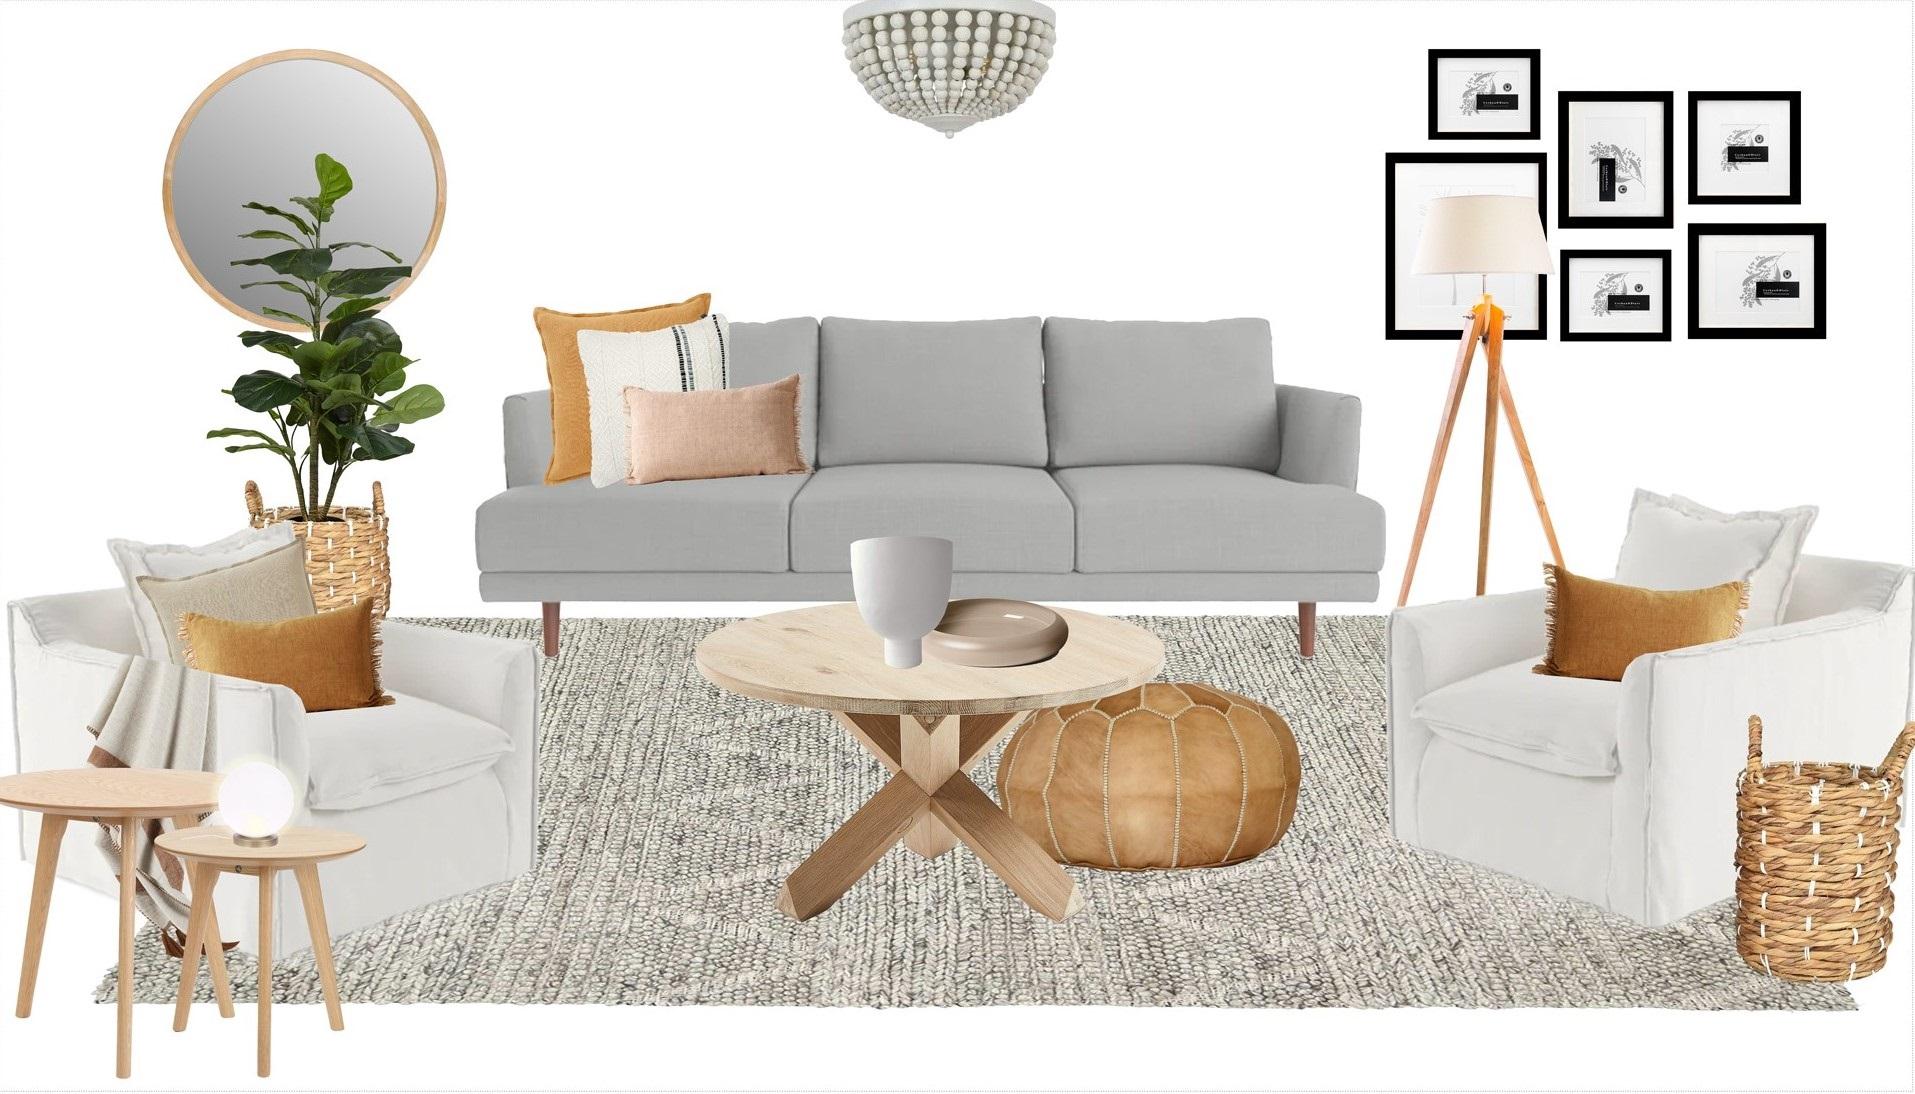 Final visualisation board for Judea's Living Room.